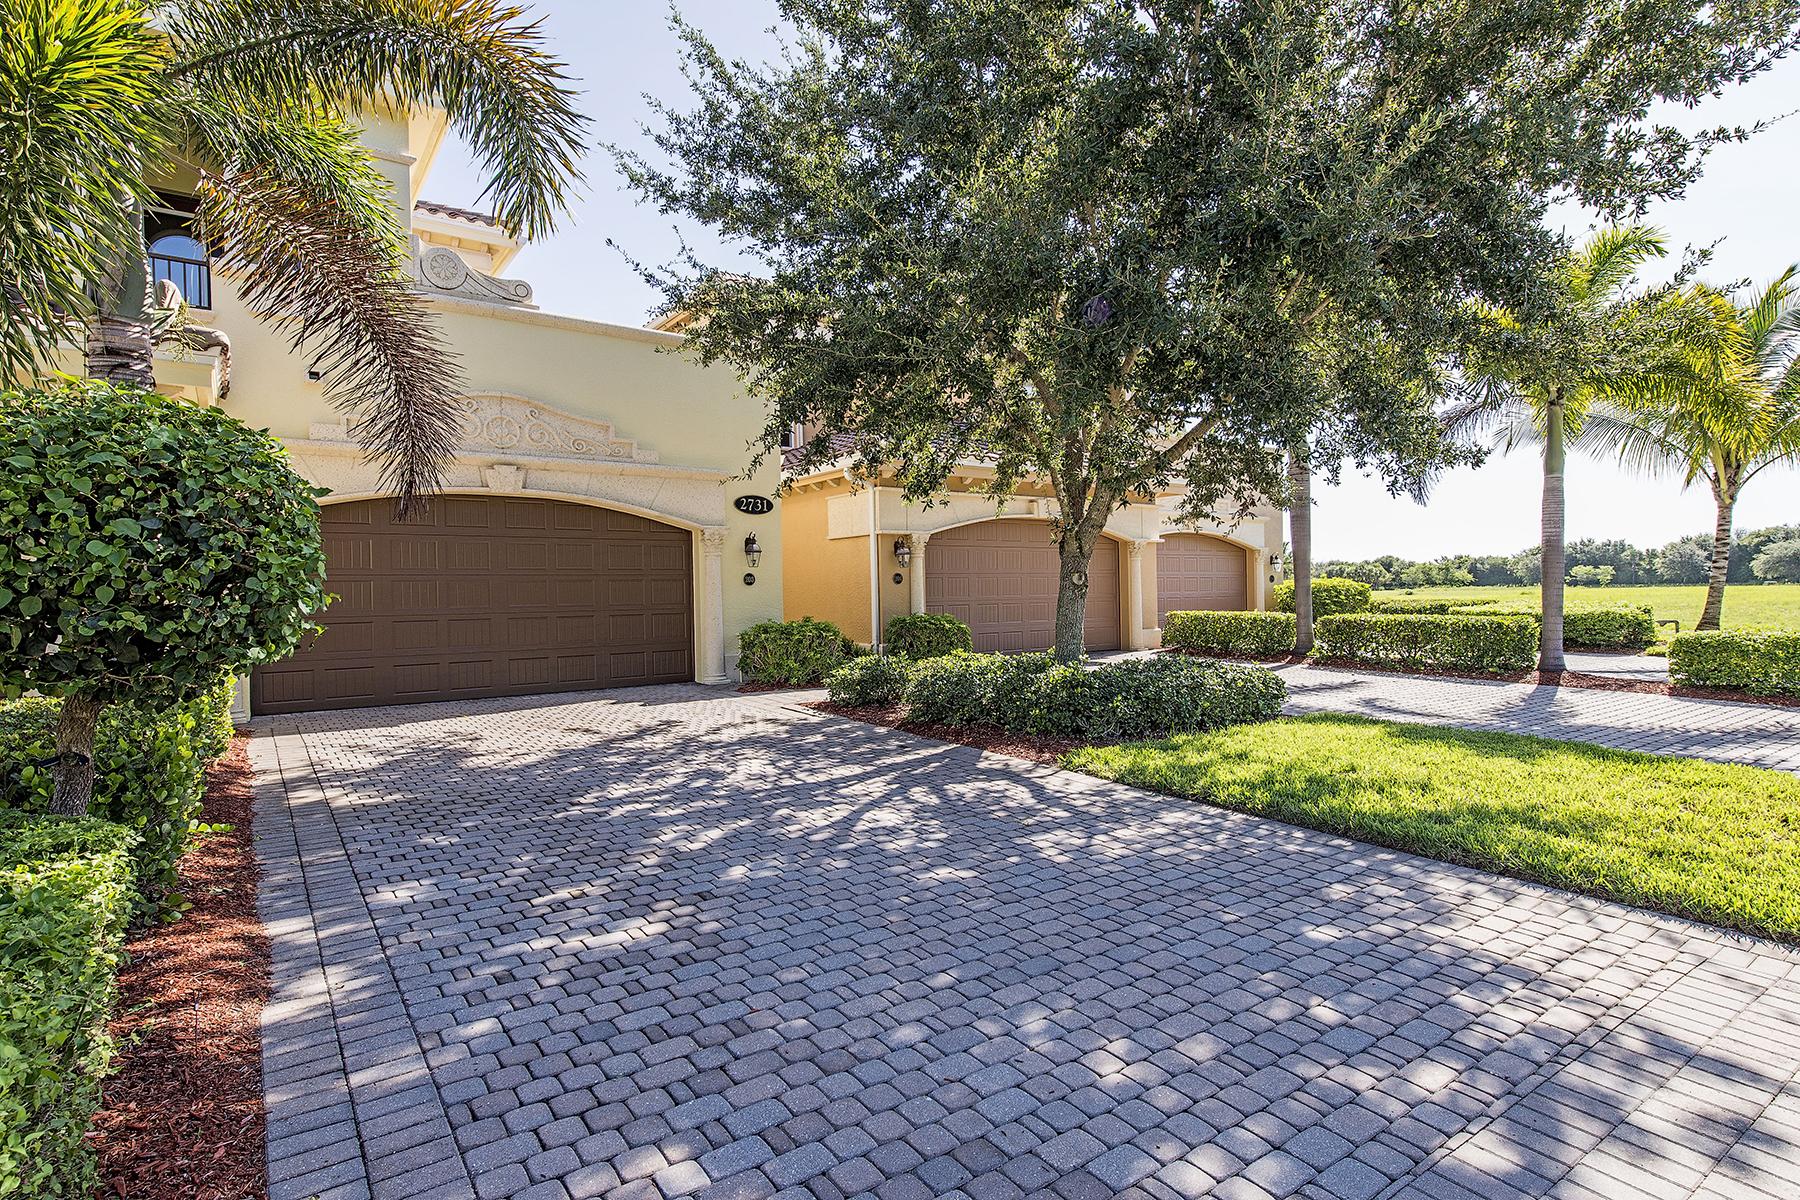 Condominio por un Venta en FIDDLER'S CREEK - CALISTA 2731 Aviamar Cir 203 Naples, Florida 34114 Estados Unidos